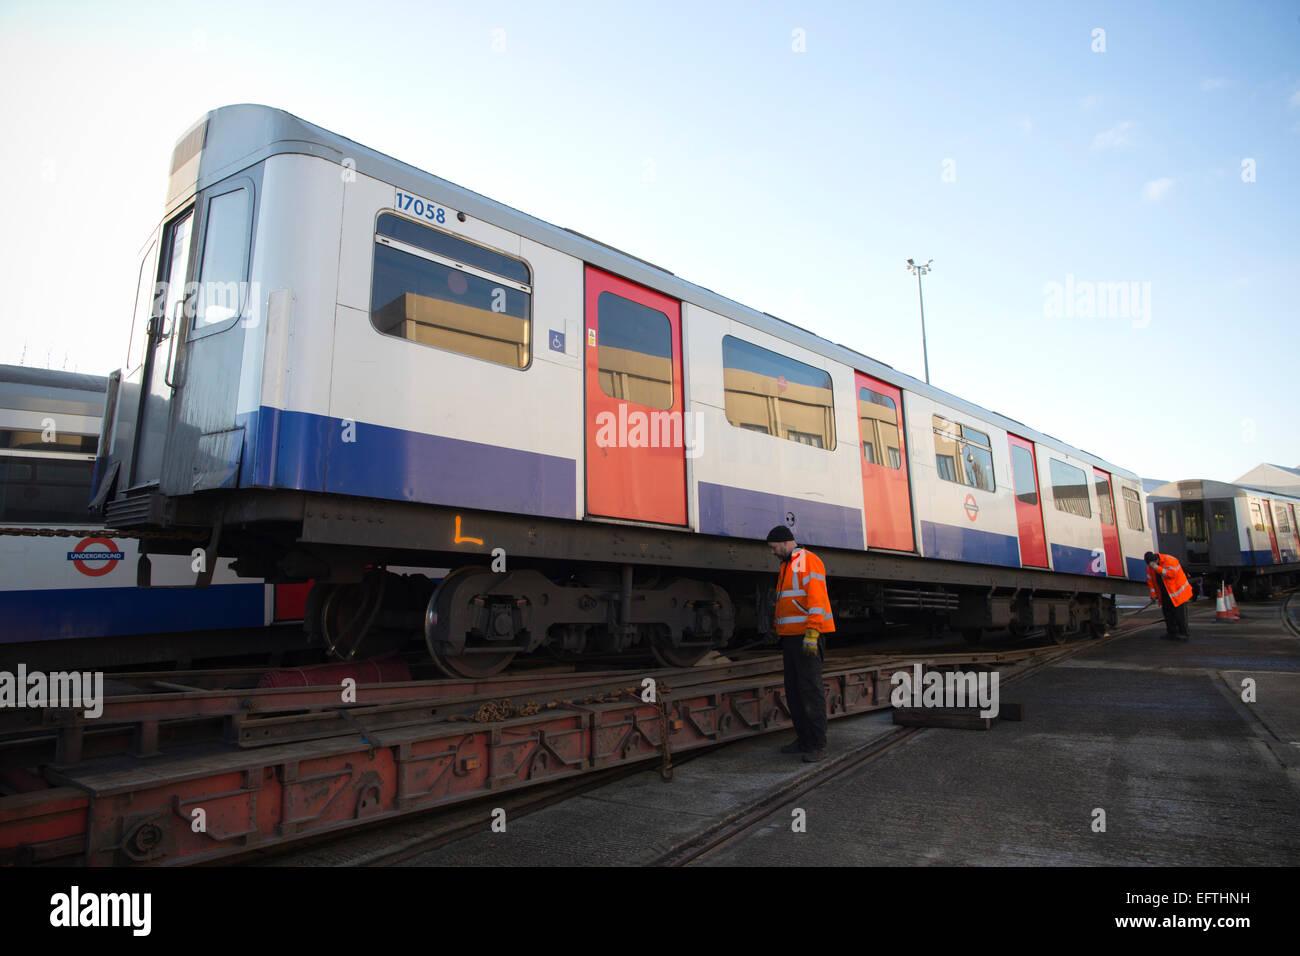 Retirada de 'D' Stock carruajes usados en el metro de Londres, Londres, Inglaterra, Reino Unido. Imagen De Stock